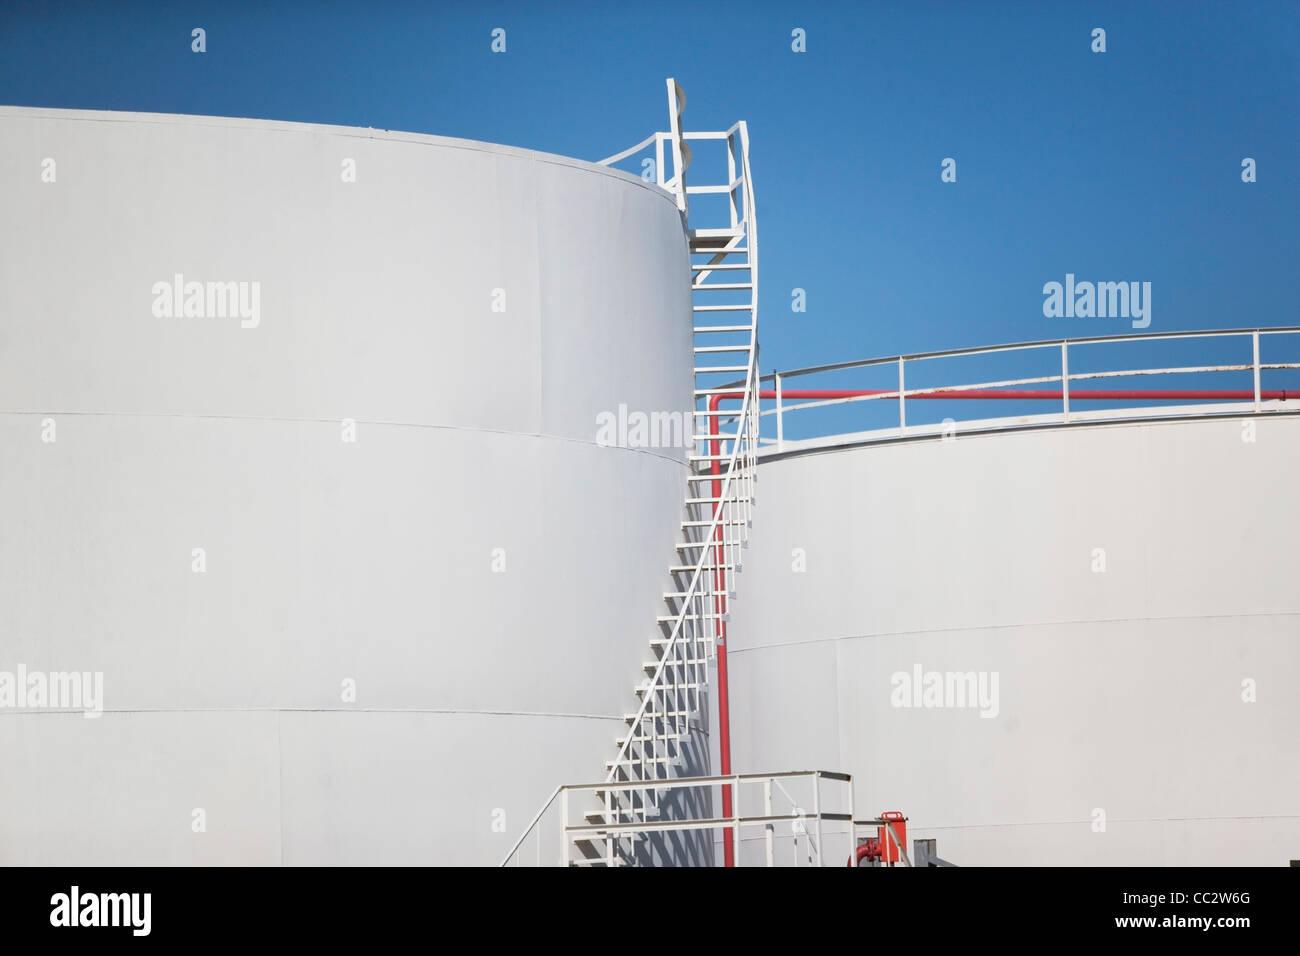 USA, New York State, New York City, Oil tank - Stock Image